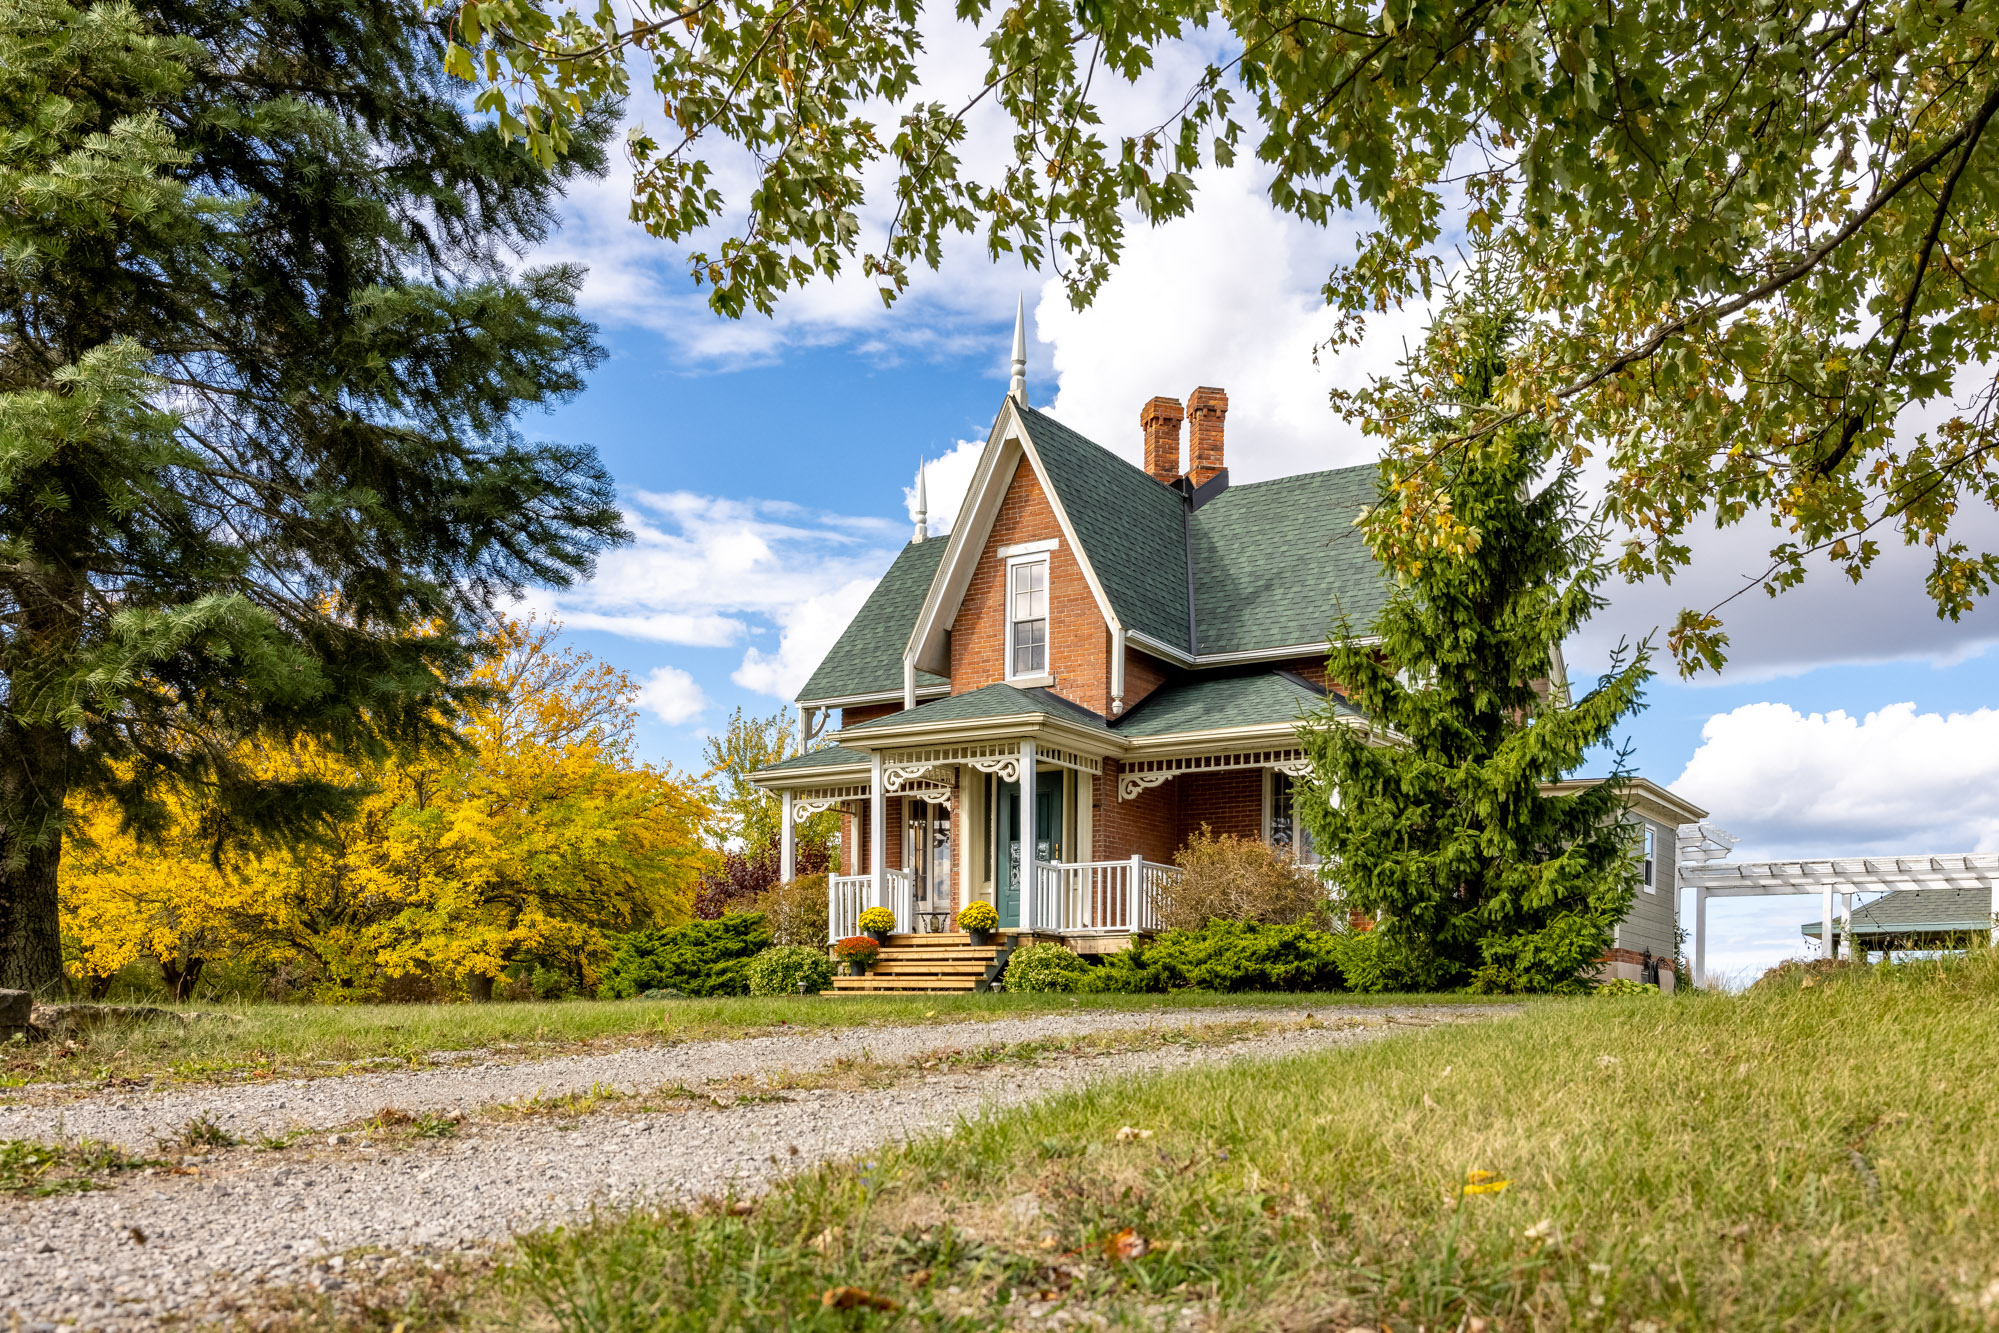 Property image for 965 Metler Rd, Pelham